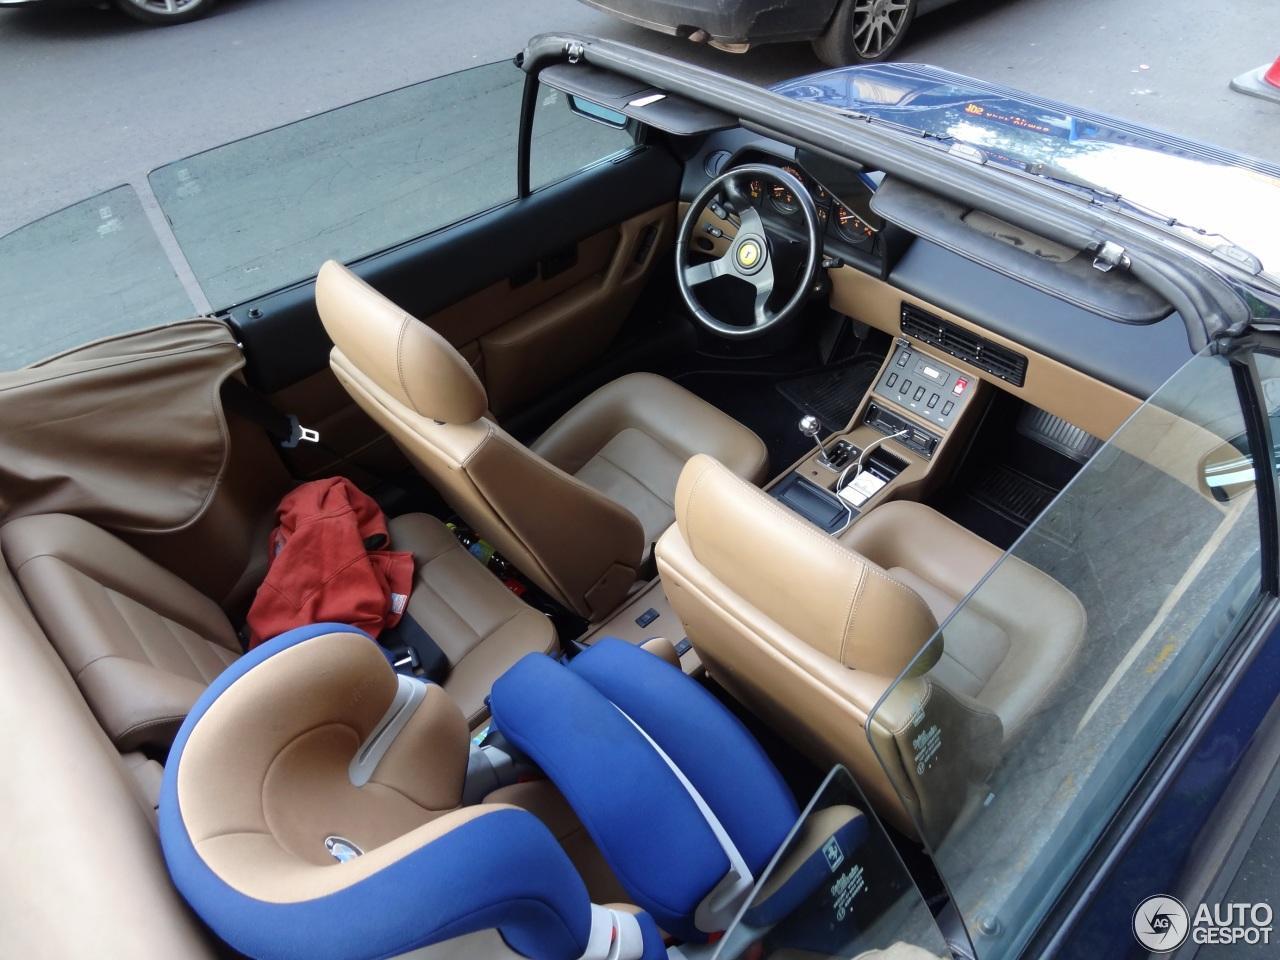 ferrari mondial t cabriolet 27 june 2013 autogespot. Black Bedroom Furniture Sets. Home Design Ideas